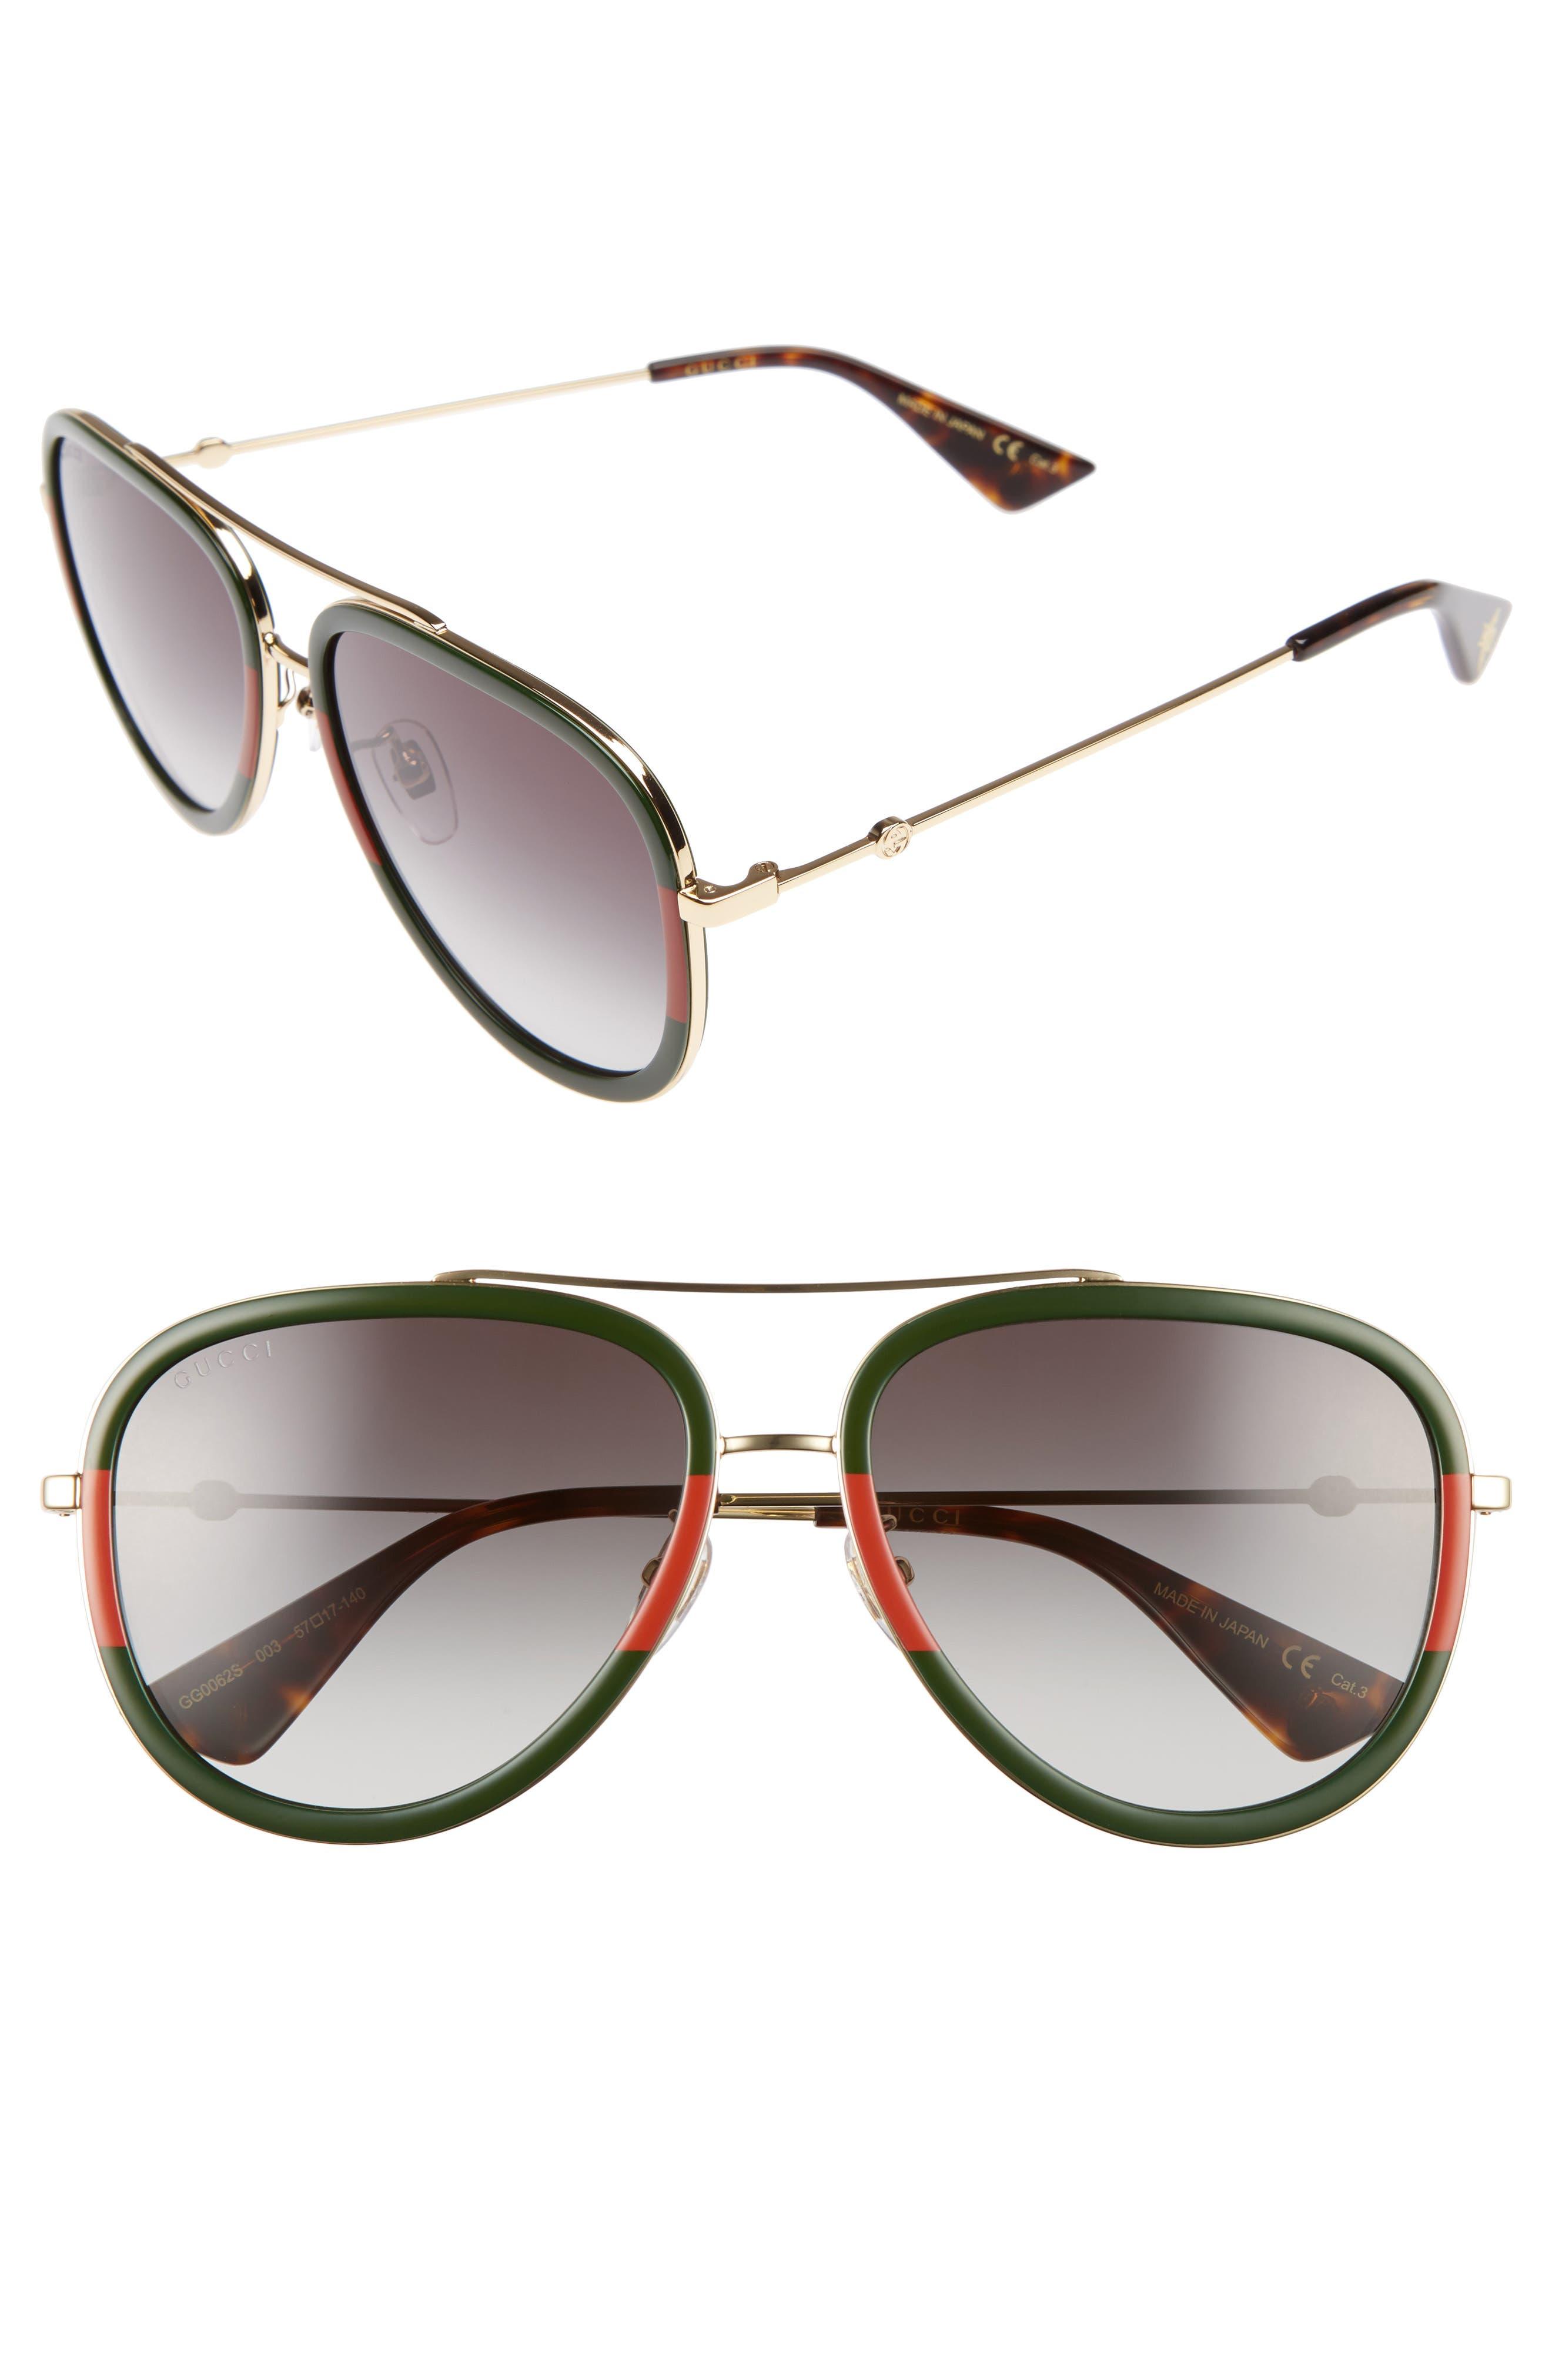 Alternate Image 1 Selected - Gucci 57mm Aviator Sunglasses